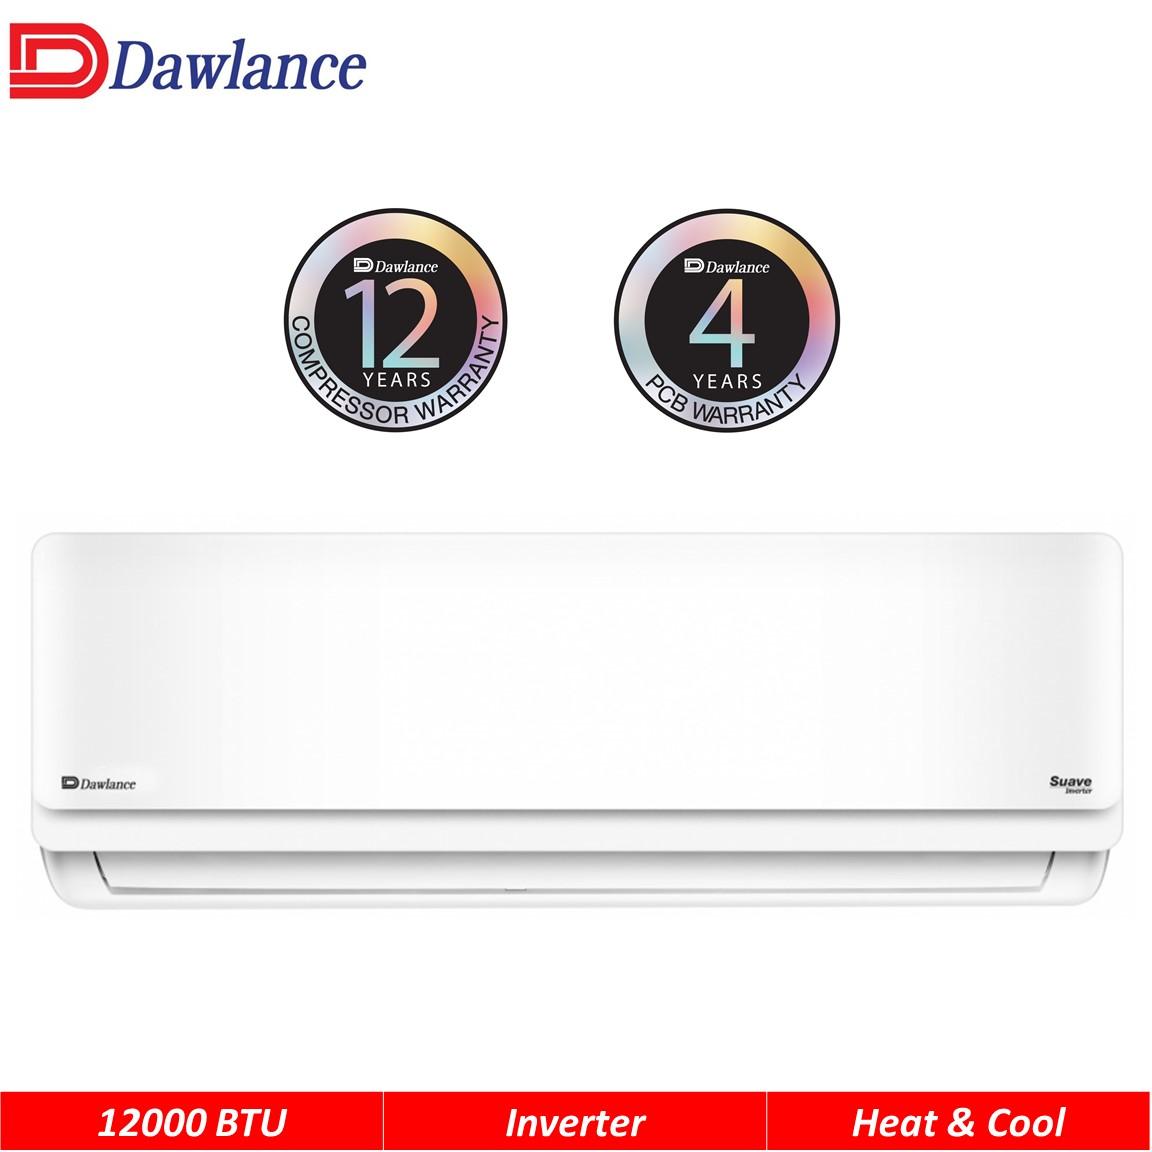 Dawlance 1.0 Ton Inverter Heat & Cool Air Conditioner Suave 15